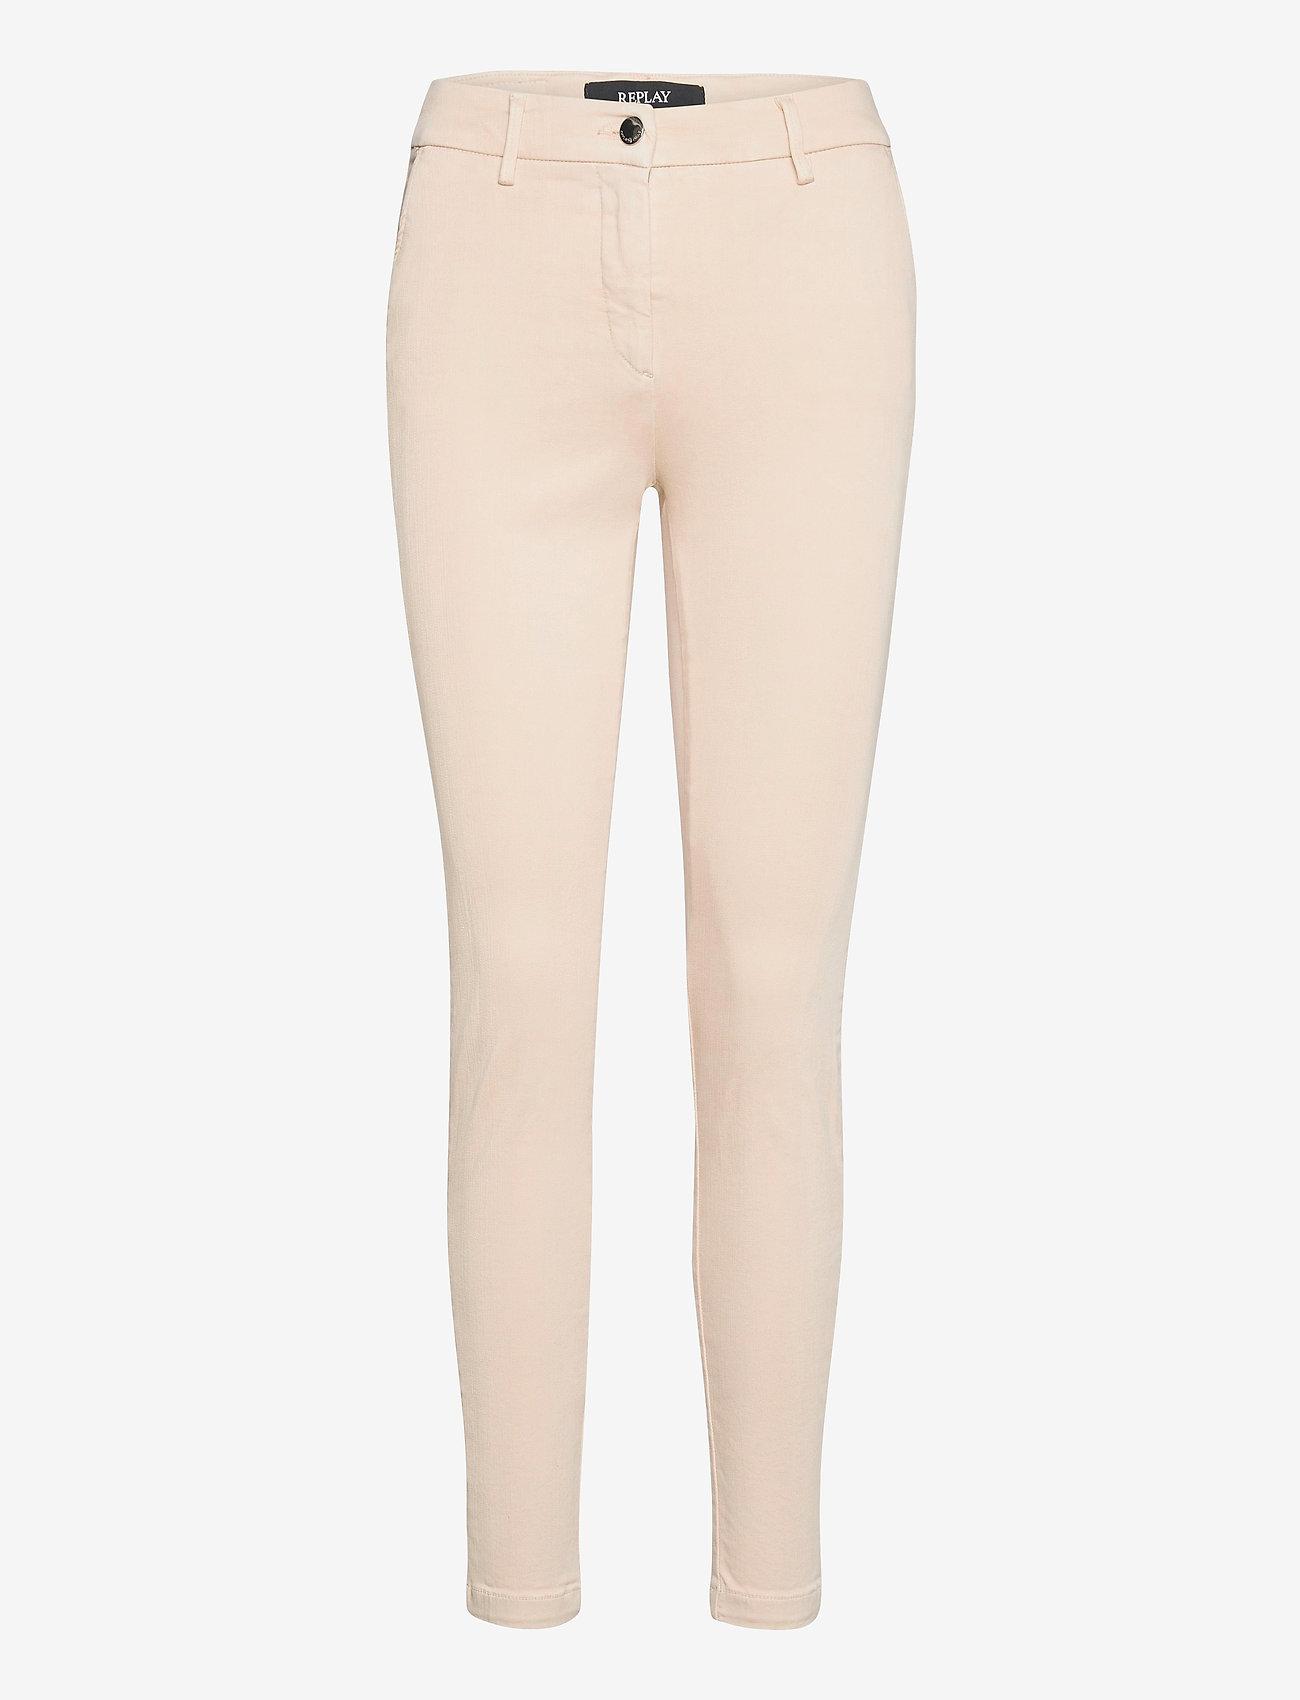 Replay - LYSA HYPERFLEX - slim jeans - cream - 0